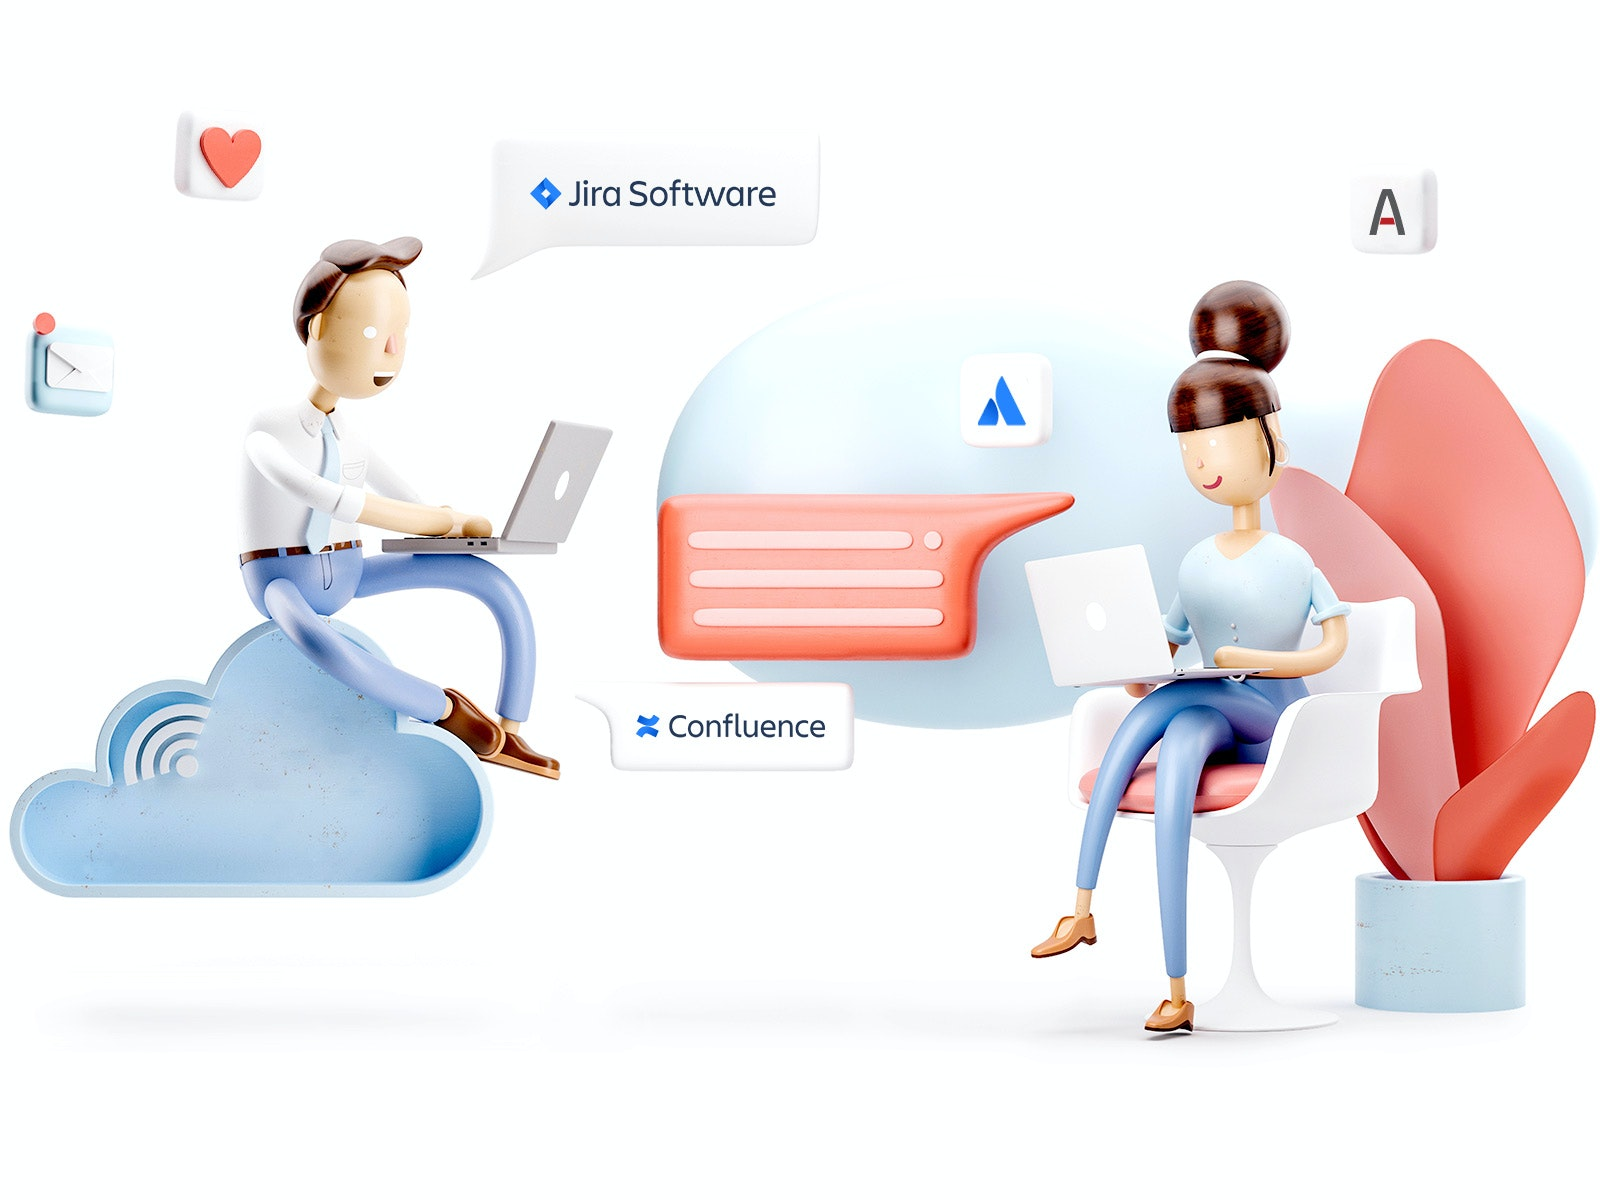 Atlassian hosting hero image